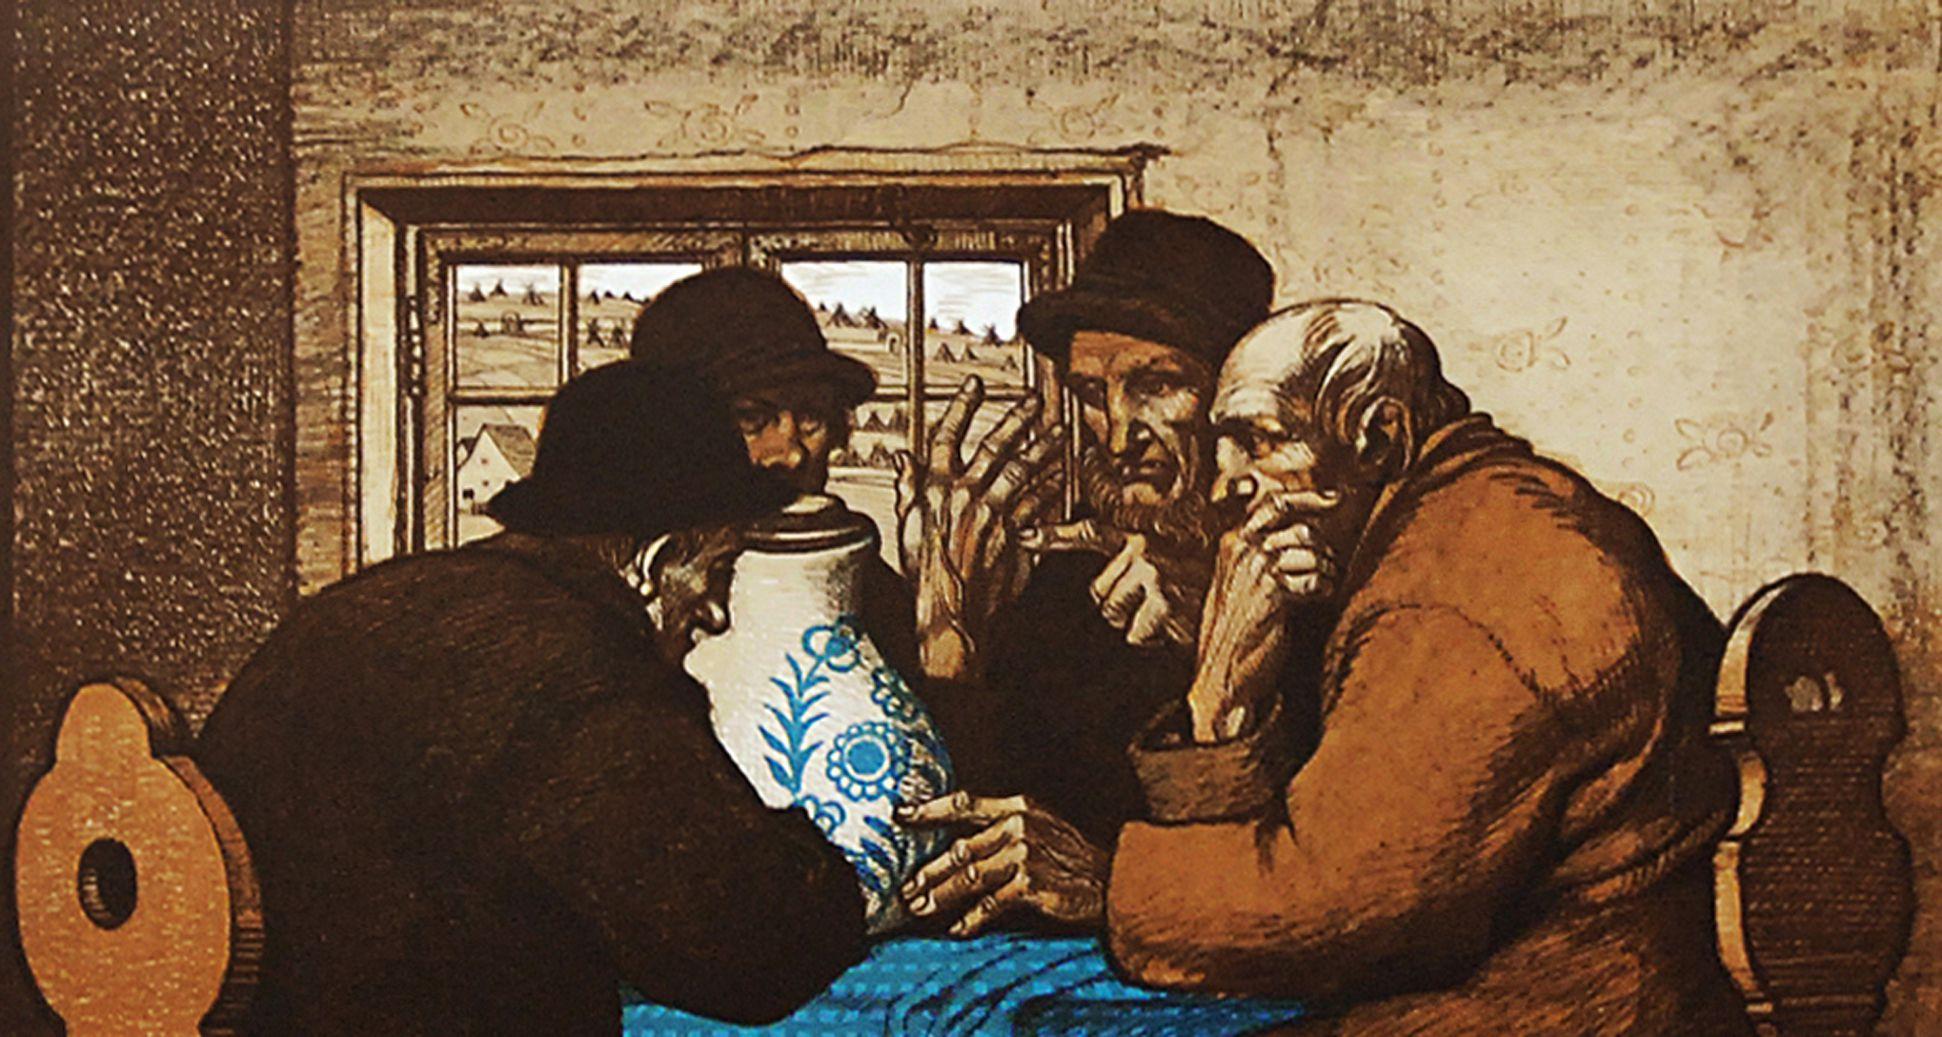 Die Trinker obere Bildhälfte